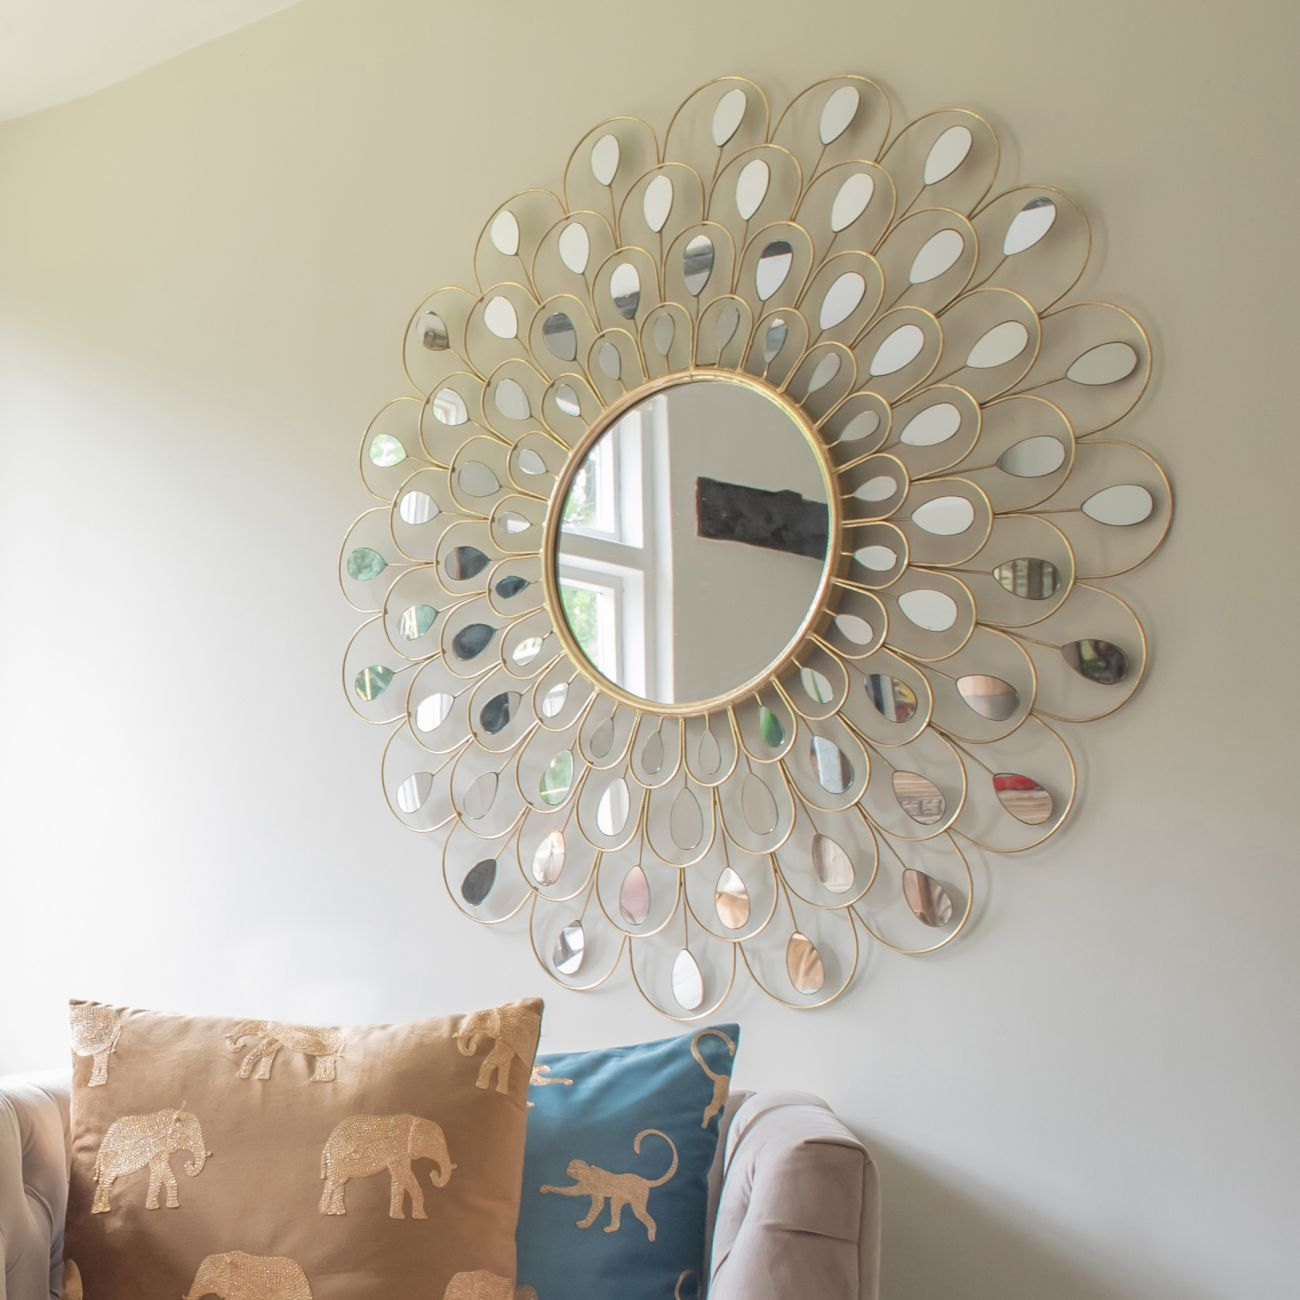 Decorative Peacock Feather Round Mirror